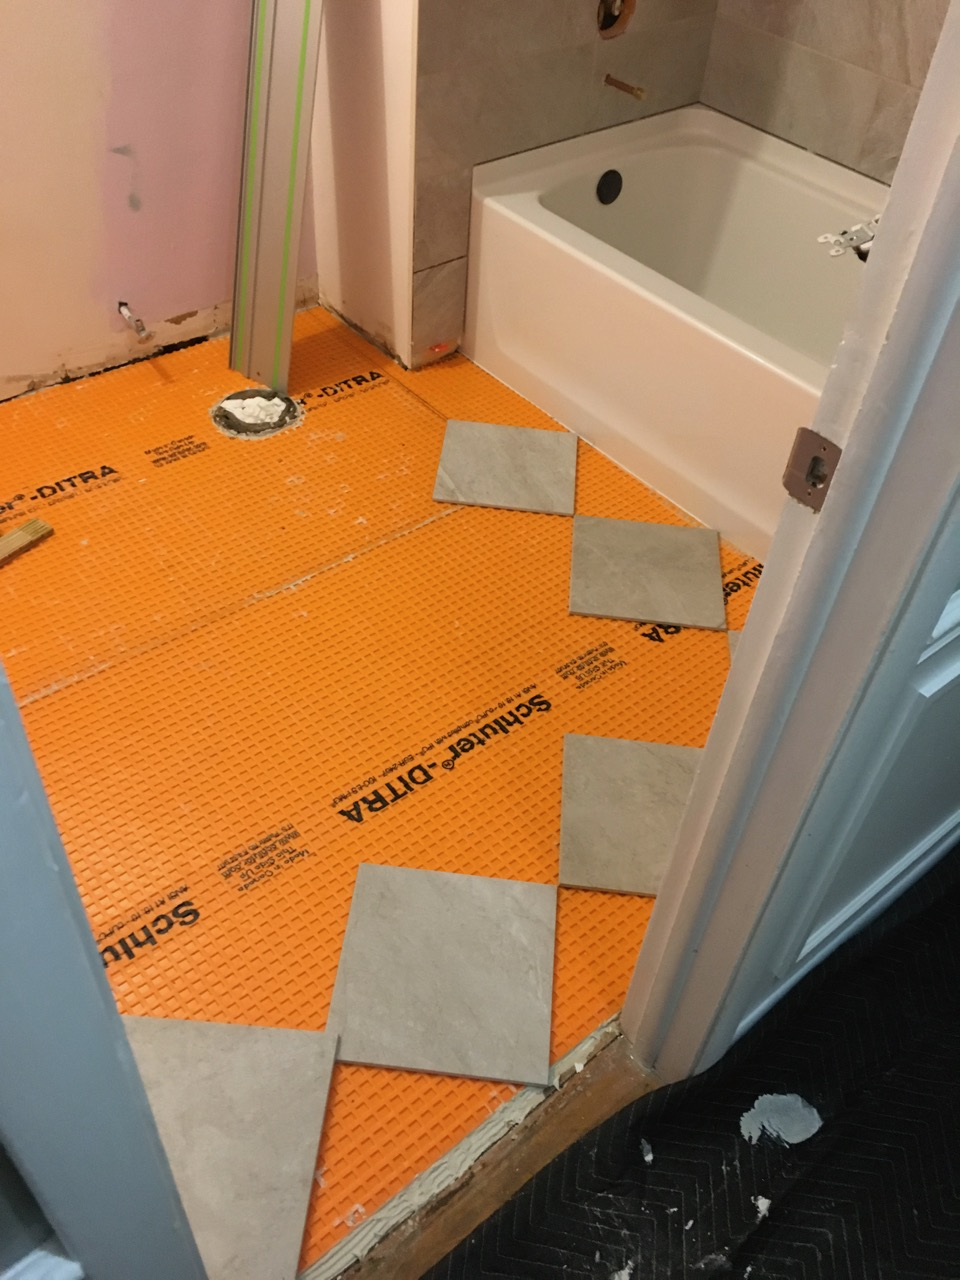 Montolit Masterpiuma Tile Cutter P3-img_2224.jpg